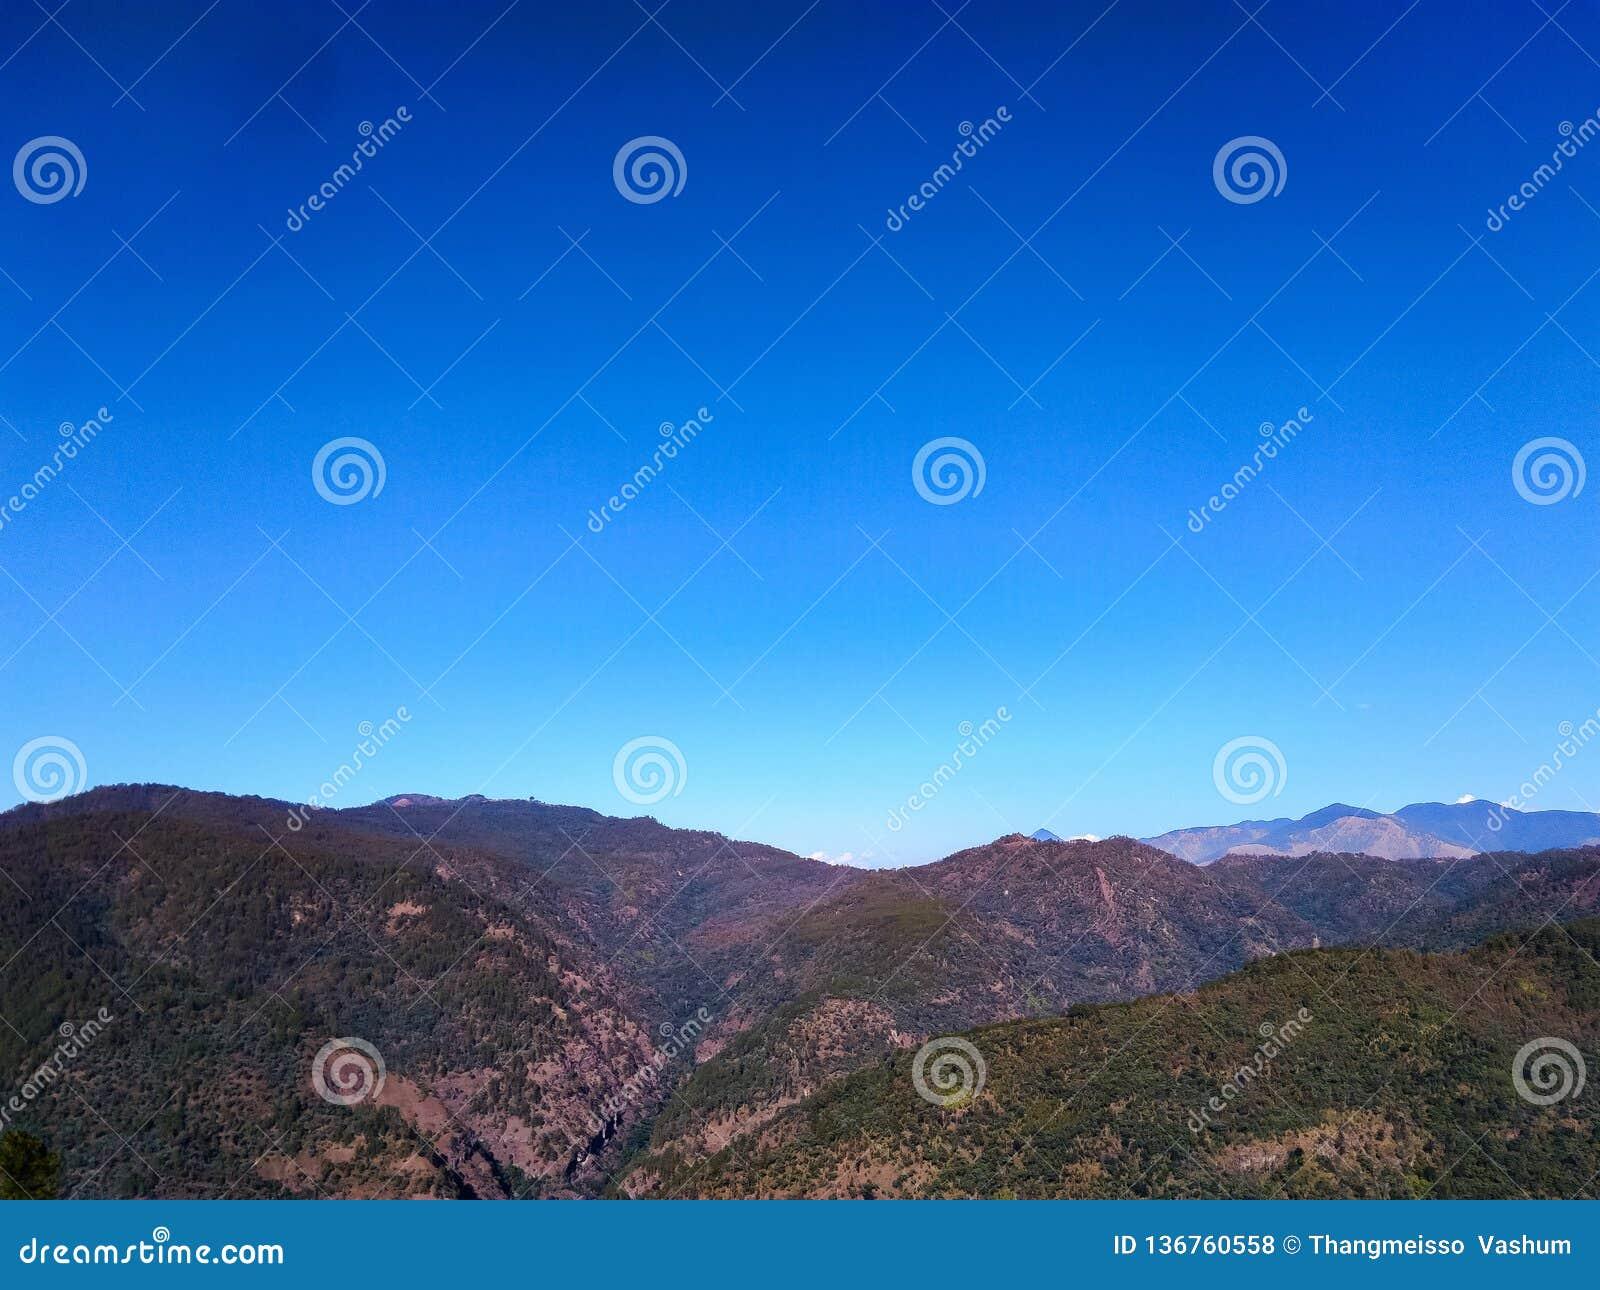 Paisagem do Mountain View azul